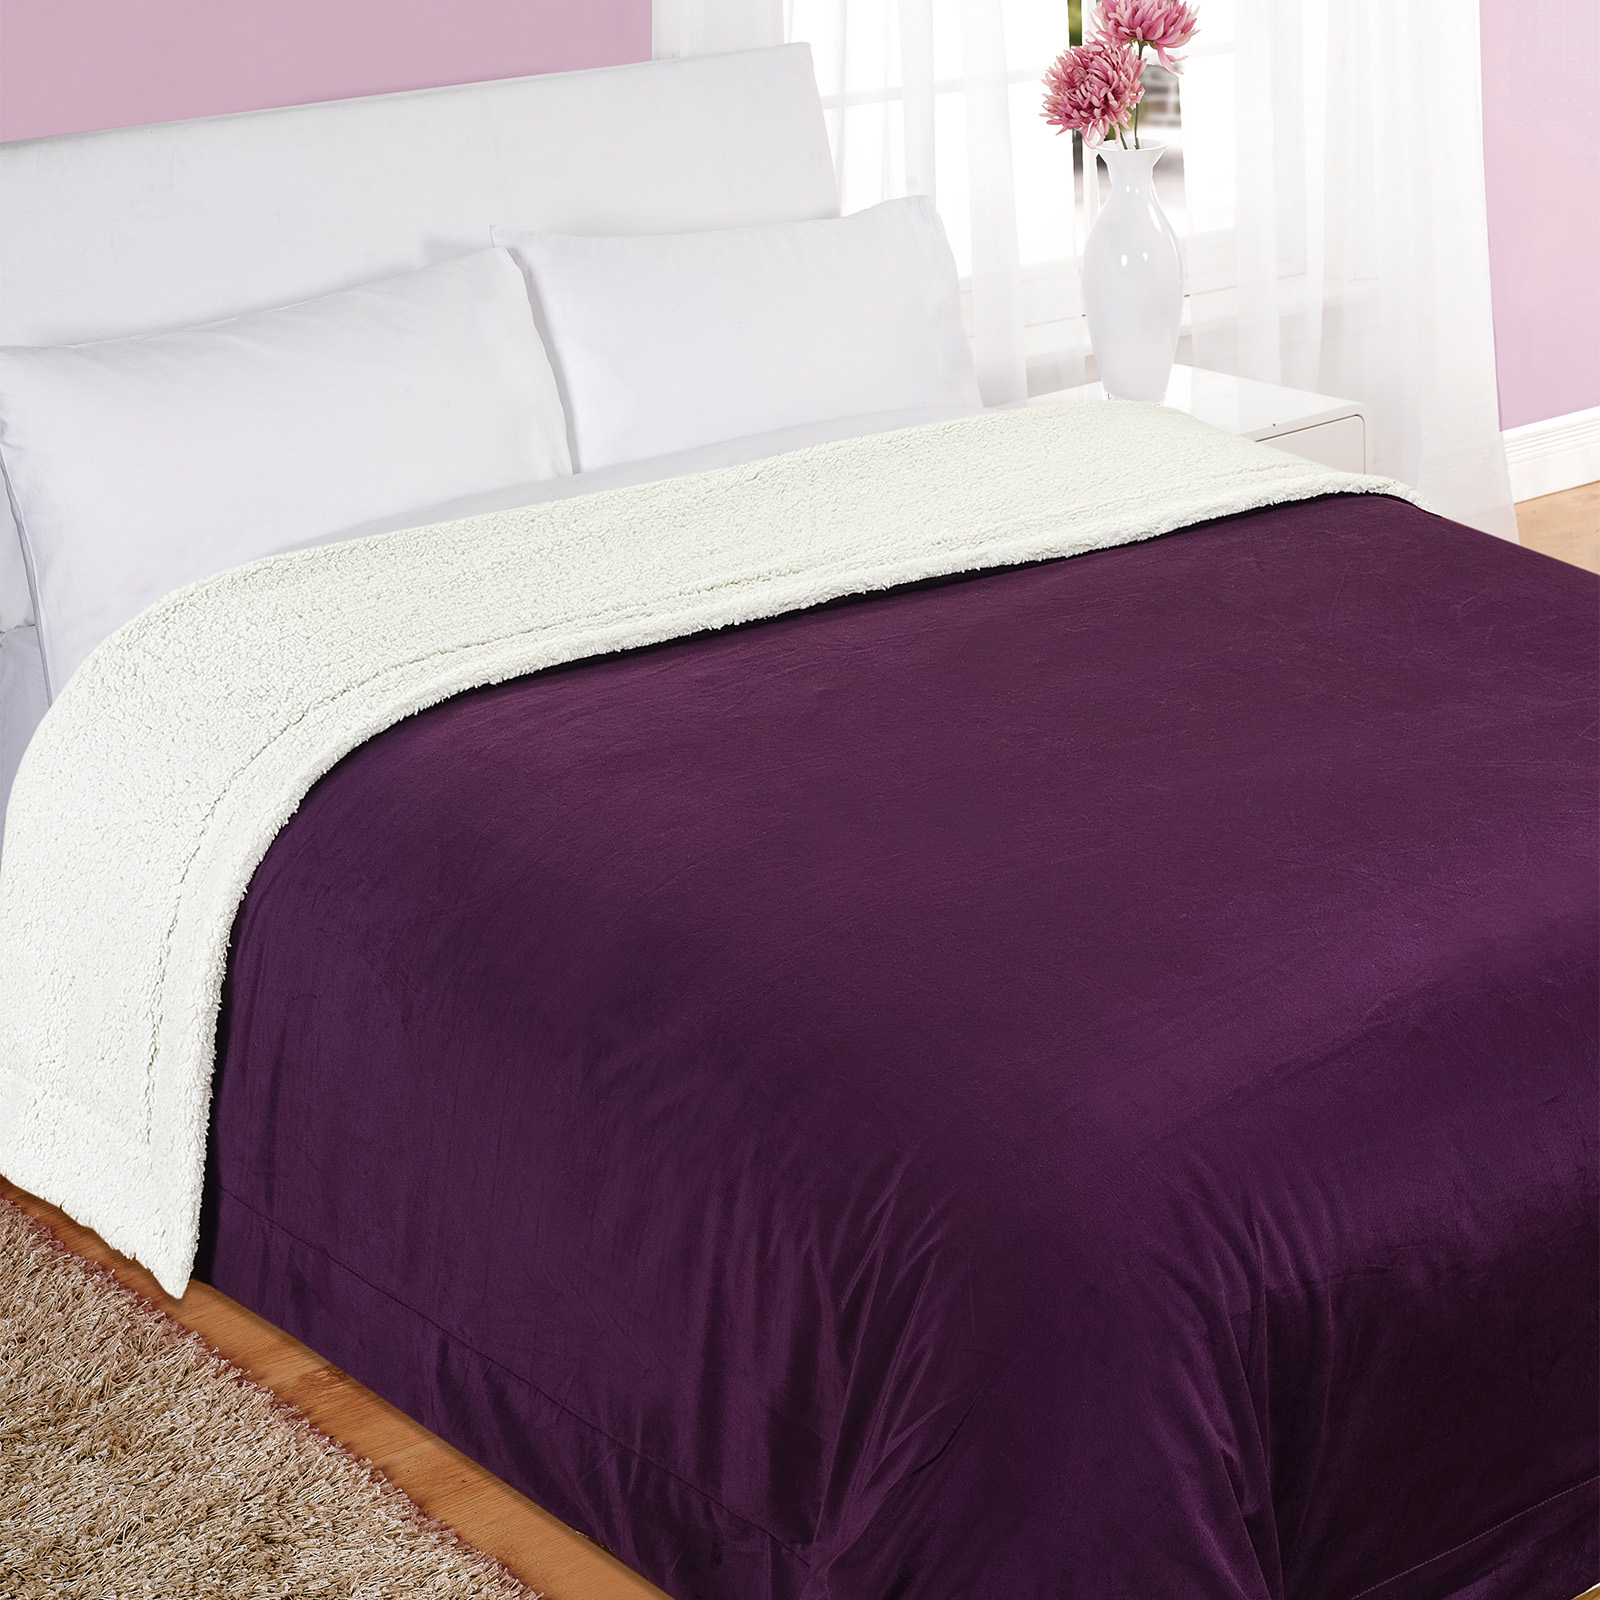 100 polyester sofa throws leather trend sleeper dreamscene luxury large snuggle soft teddy sherpa throw